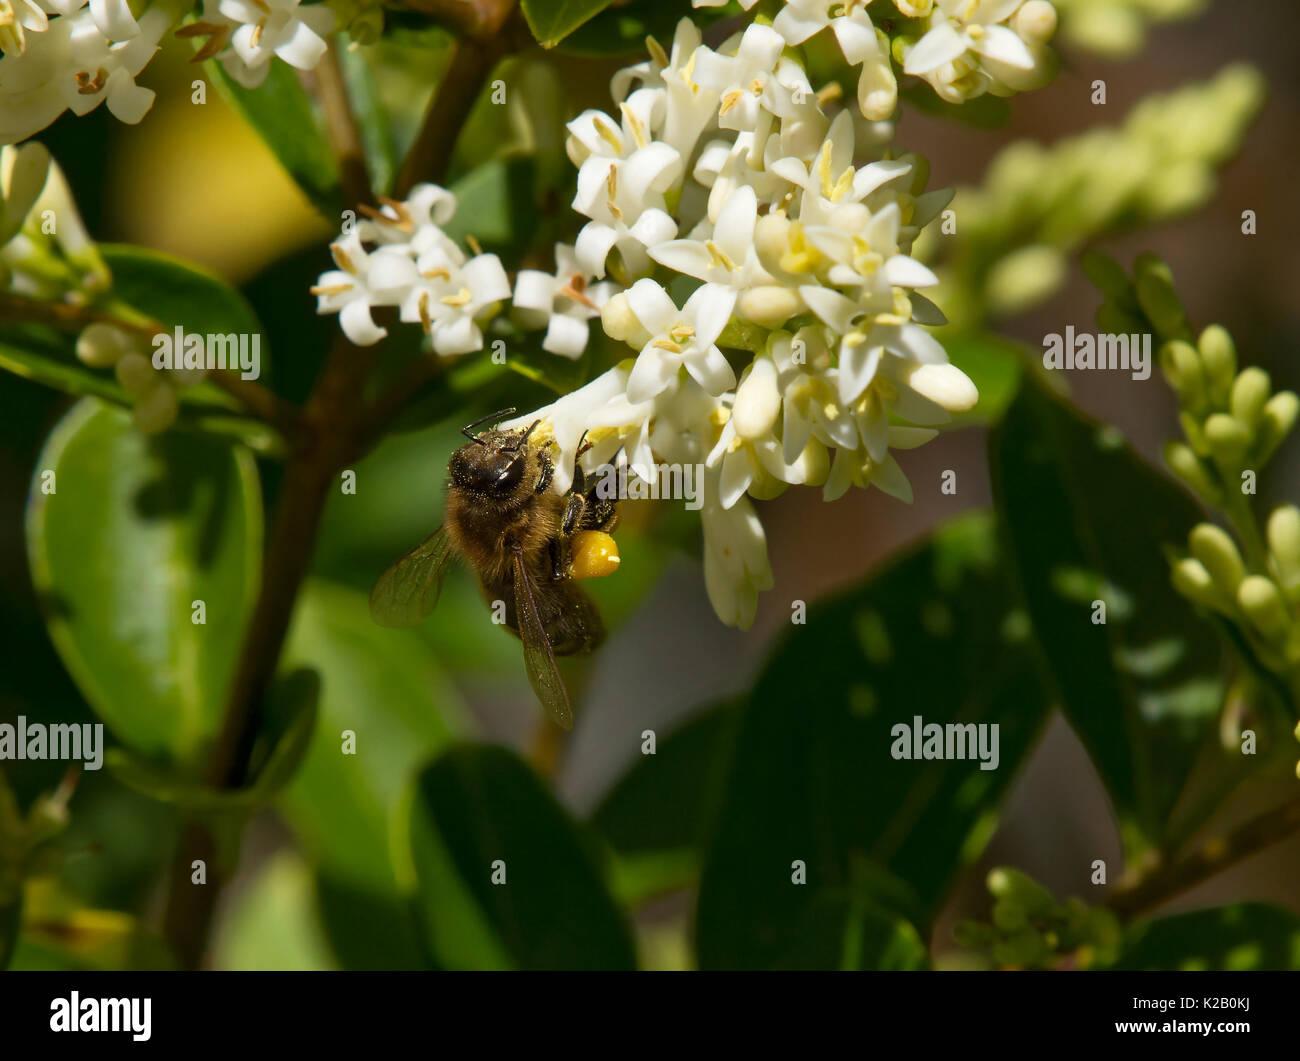 European honey bee, Apis mellifera, feeding on privet flower with full pollen sacs, Carmarthenshire, wales - Stock Image